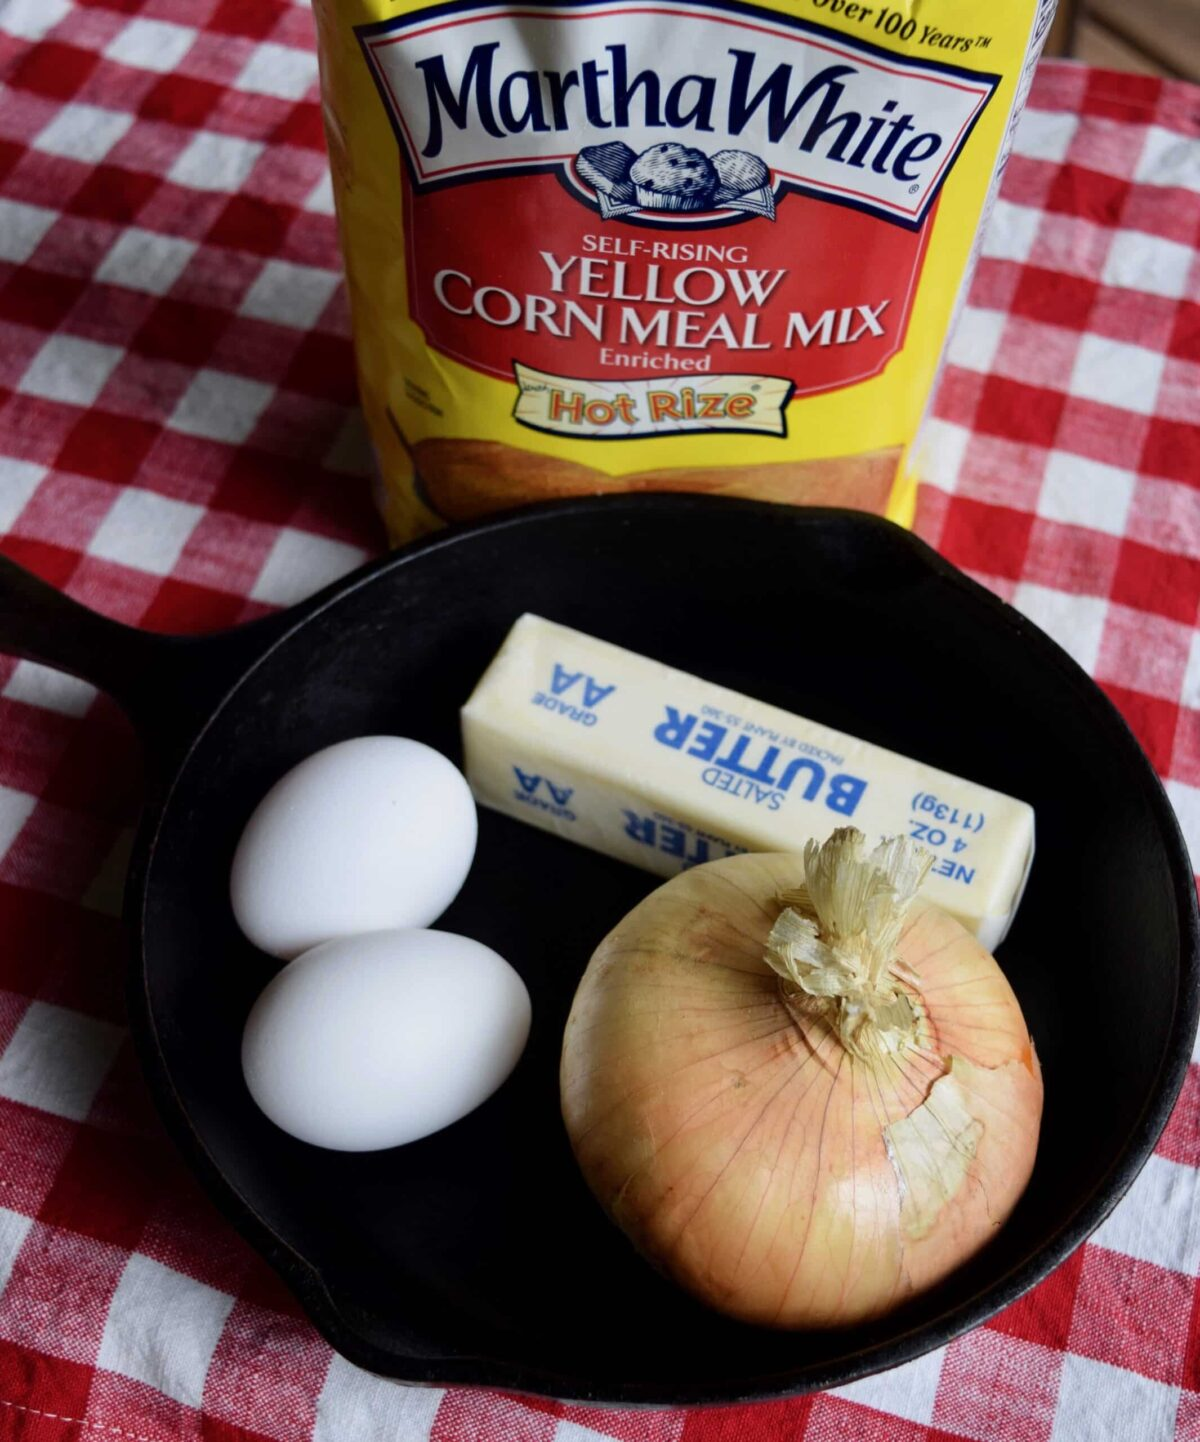 bag of martha white cornmeal mix, eggs, vidalia onion, butter in cast iron skillet